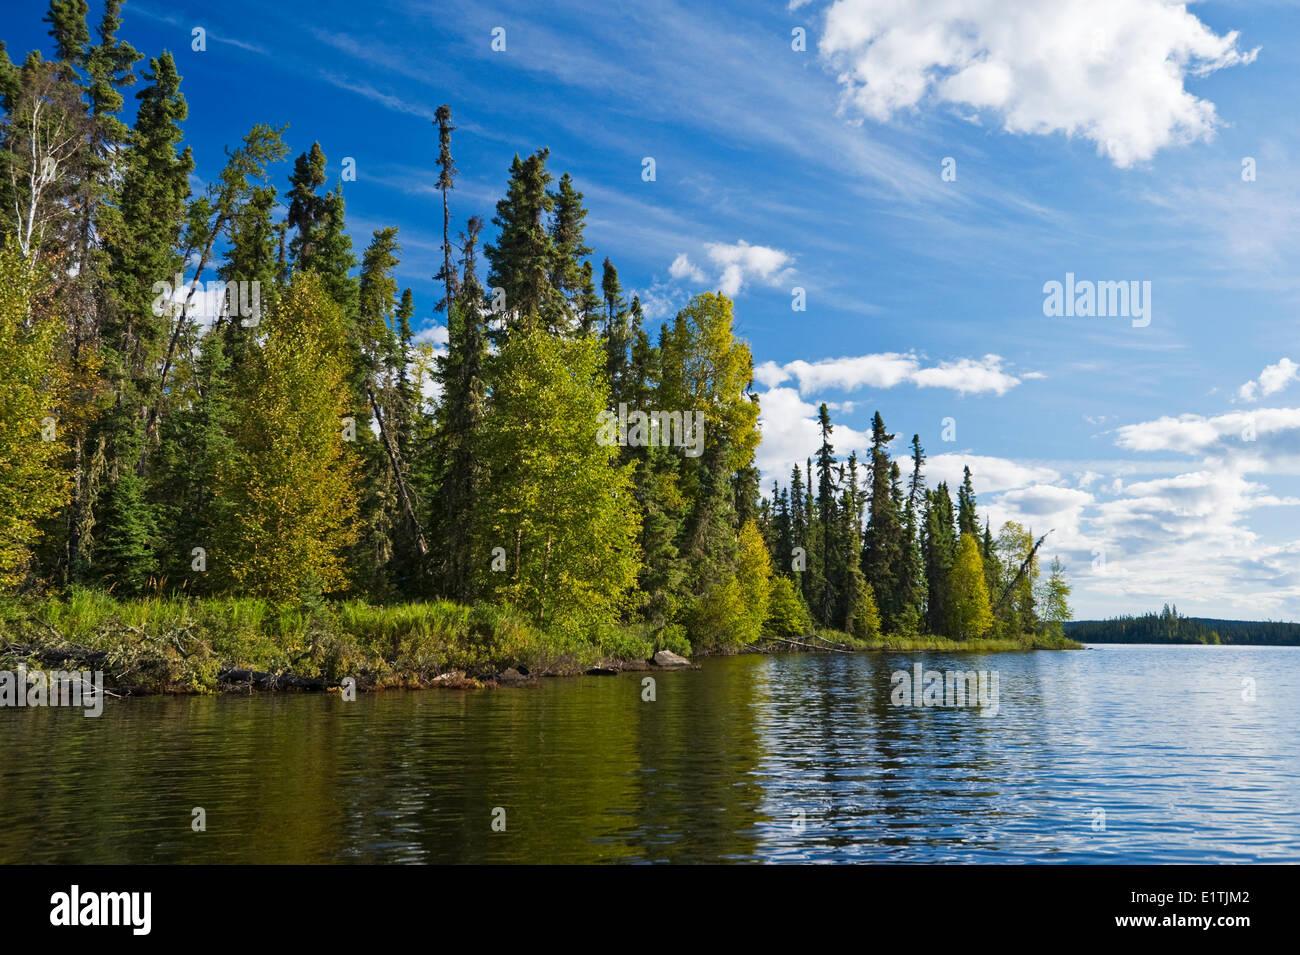 spruce forest along lake, Little Deer Lake, Lac La Ronge Provincial Park,  Northern Saskatchewan, Canada - Stock Image